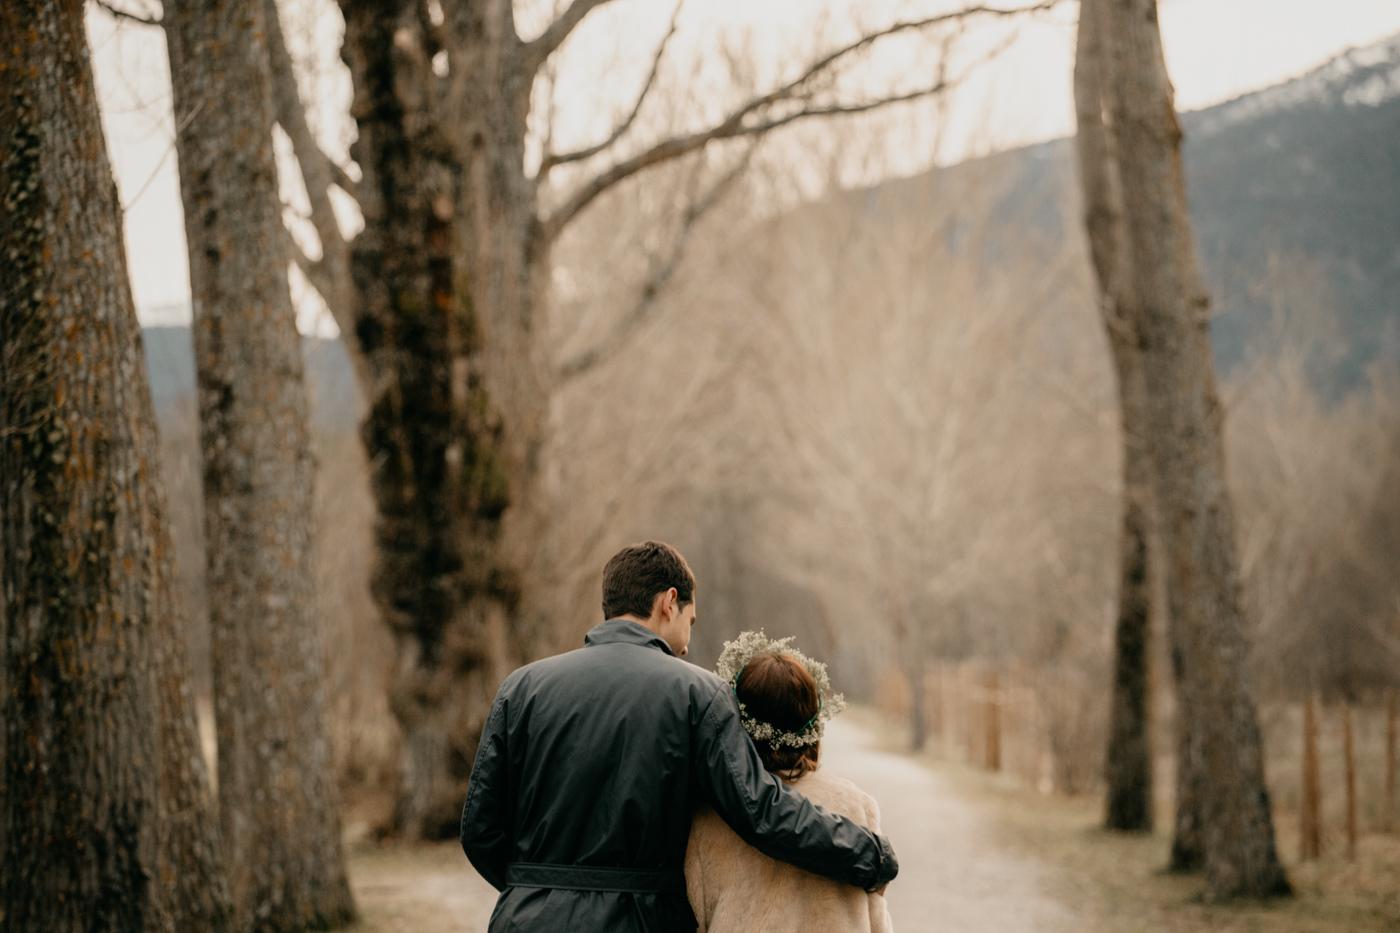 Velvet-Hush-fotografos-boda-al-aire-libre-madrid-113